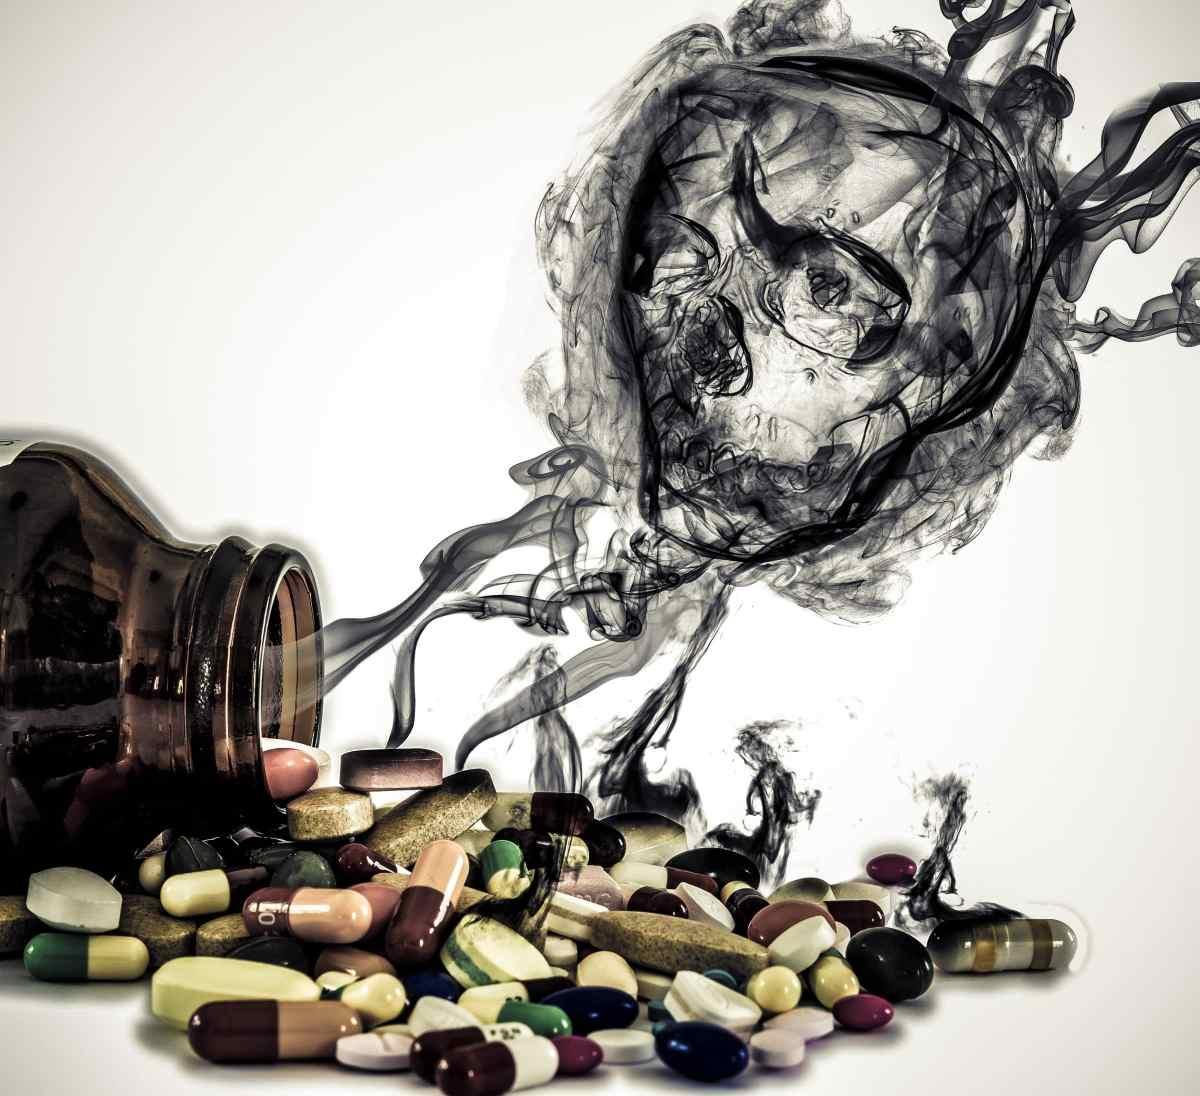 Do drug trials underestimate side effects?